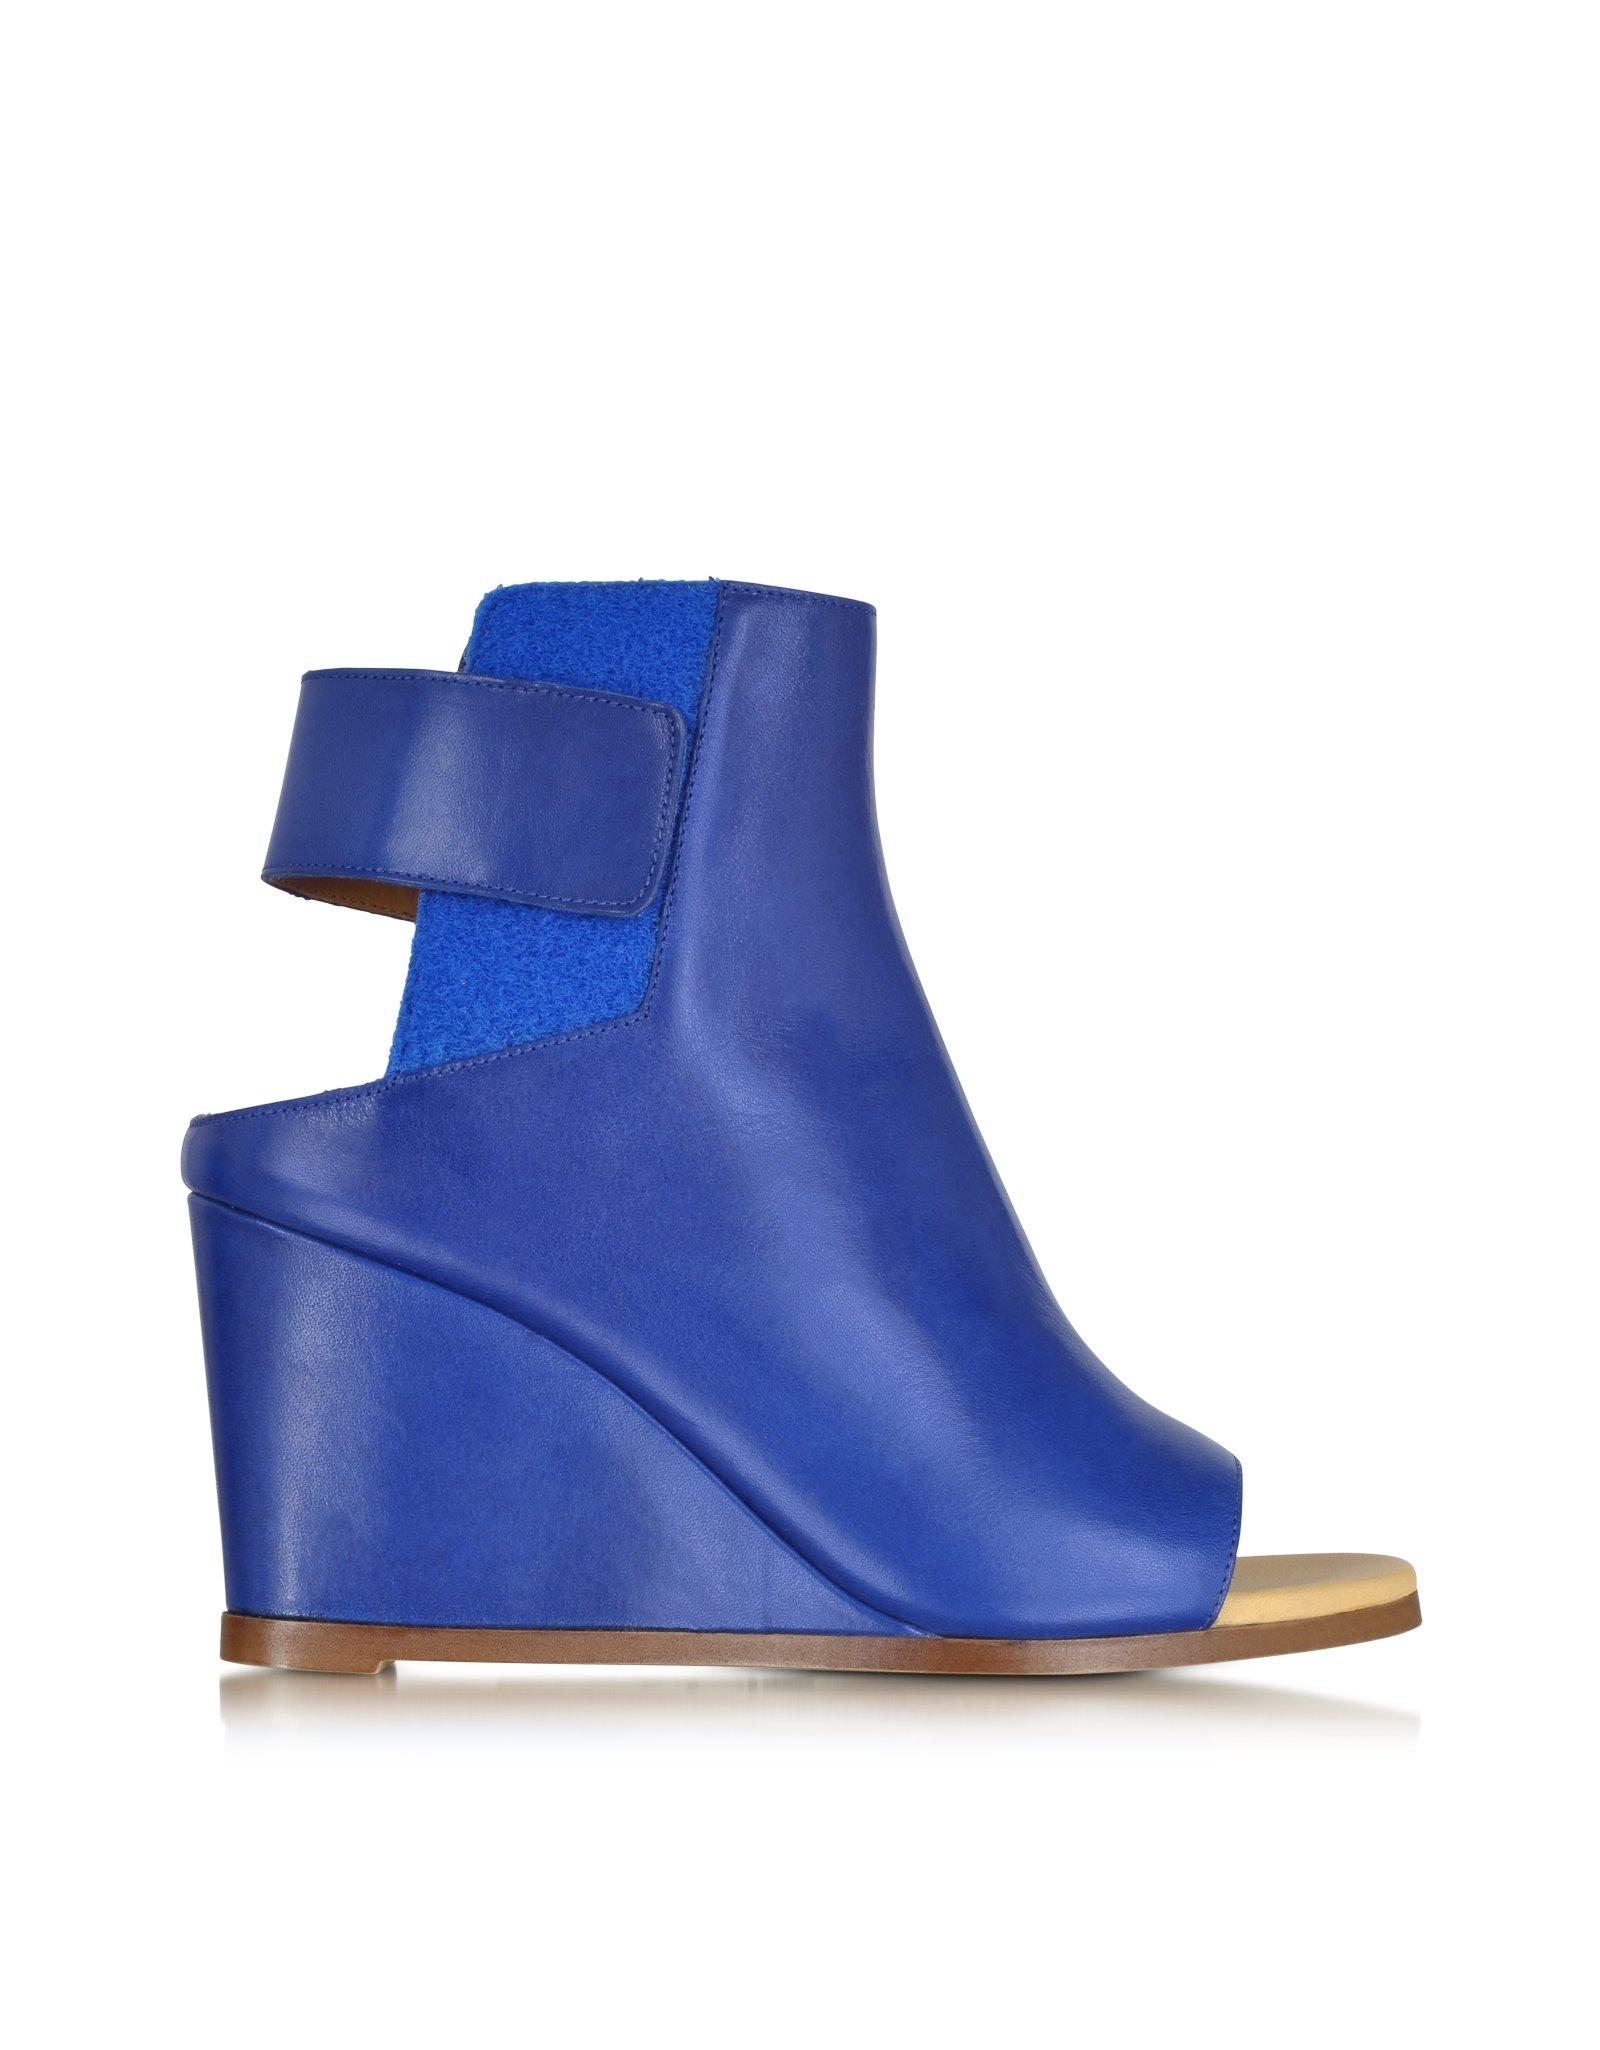 Footwear - Ankle Boots Maison Martin Margiela Thm0bR